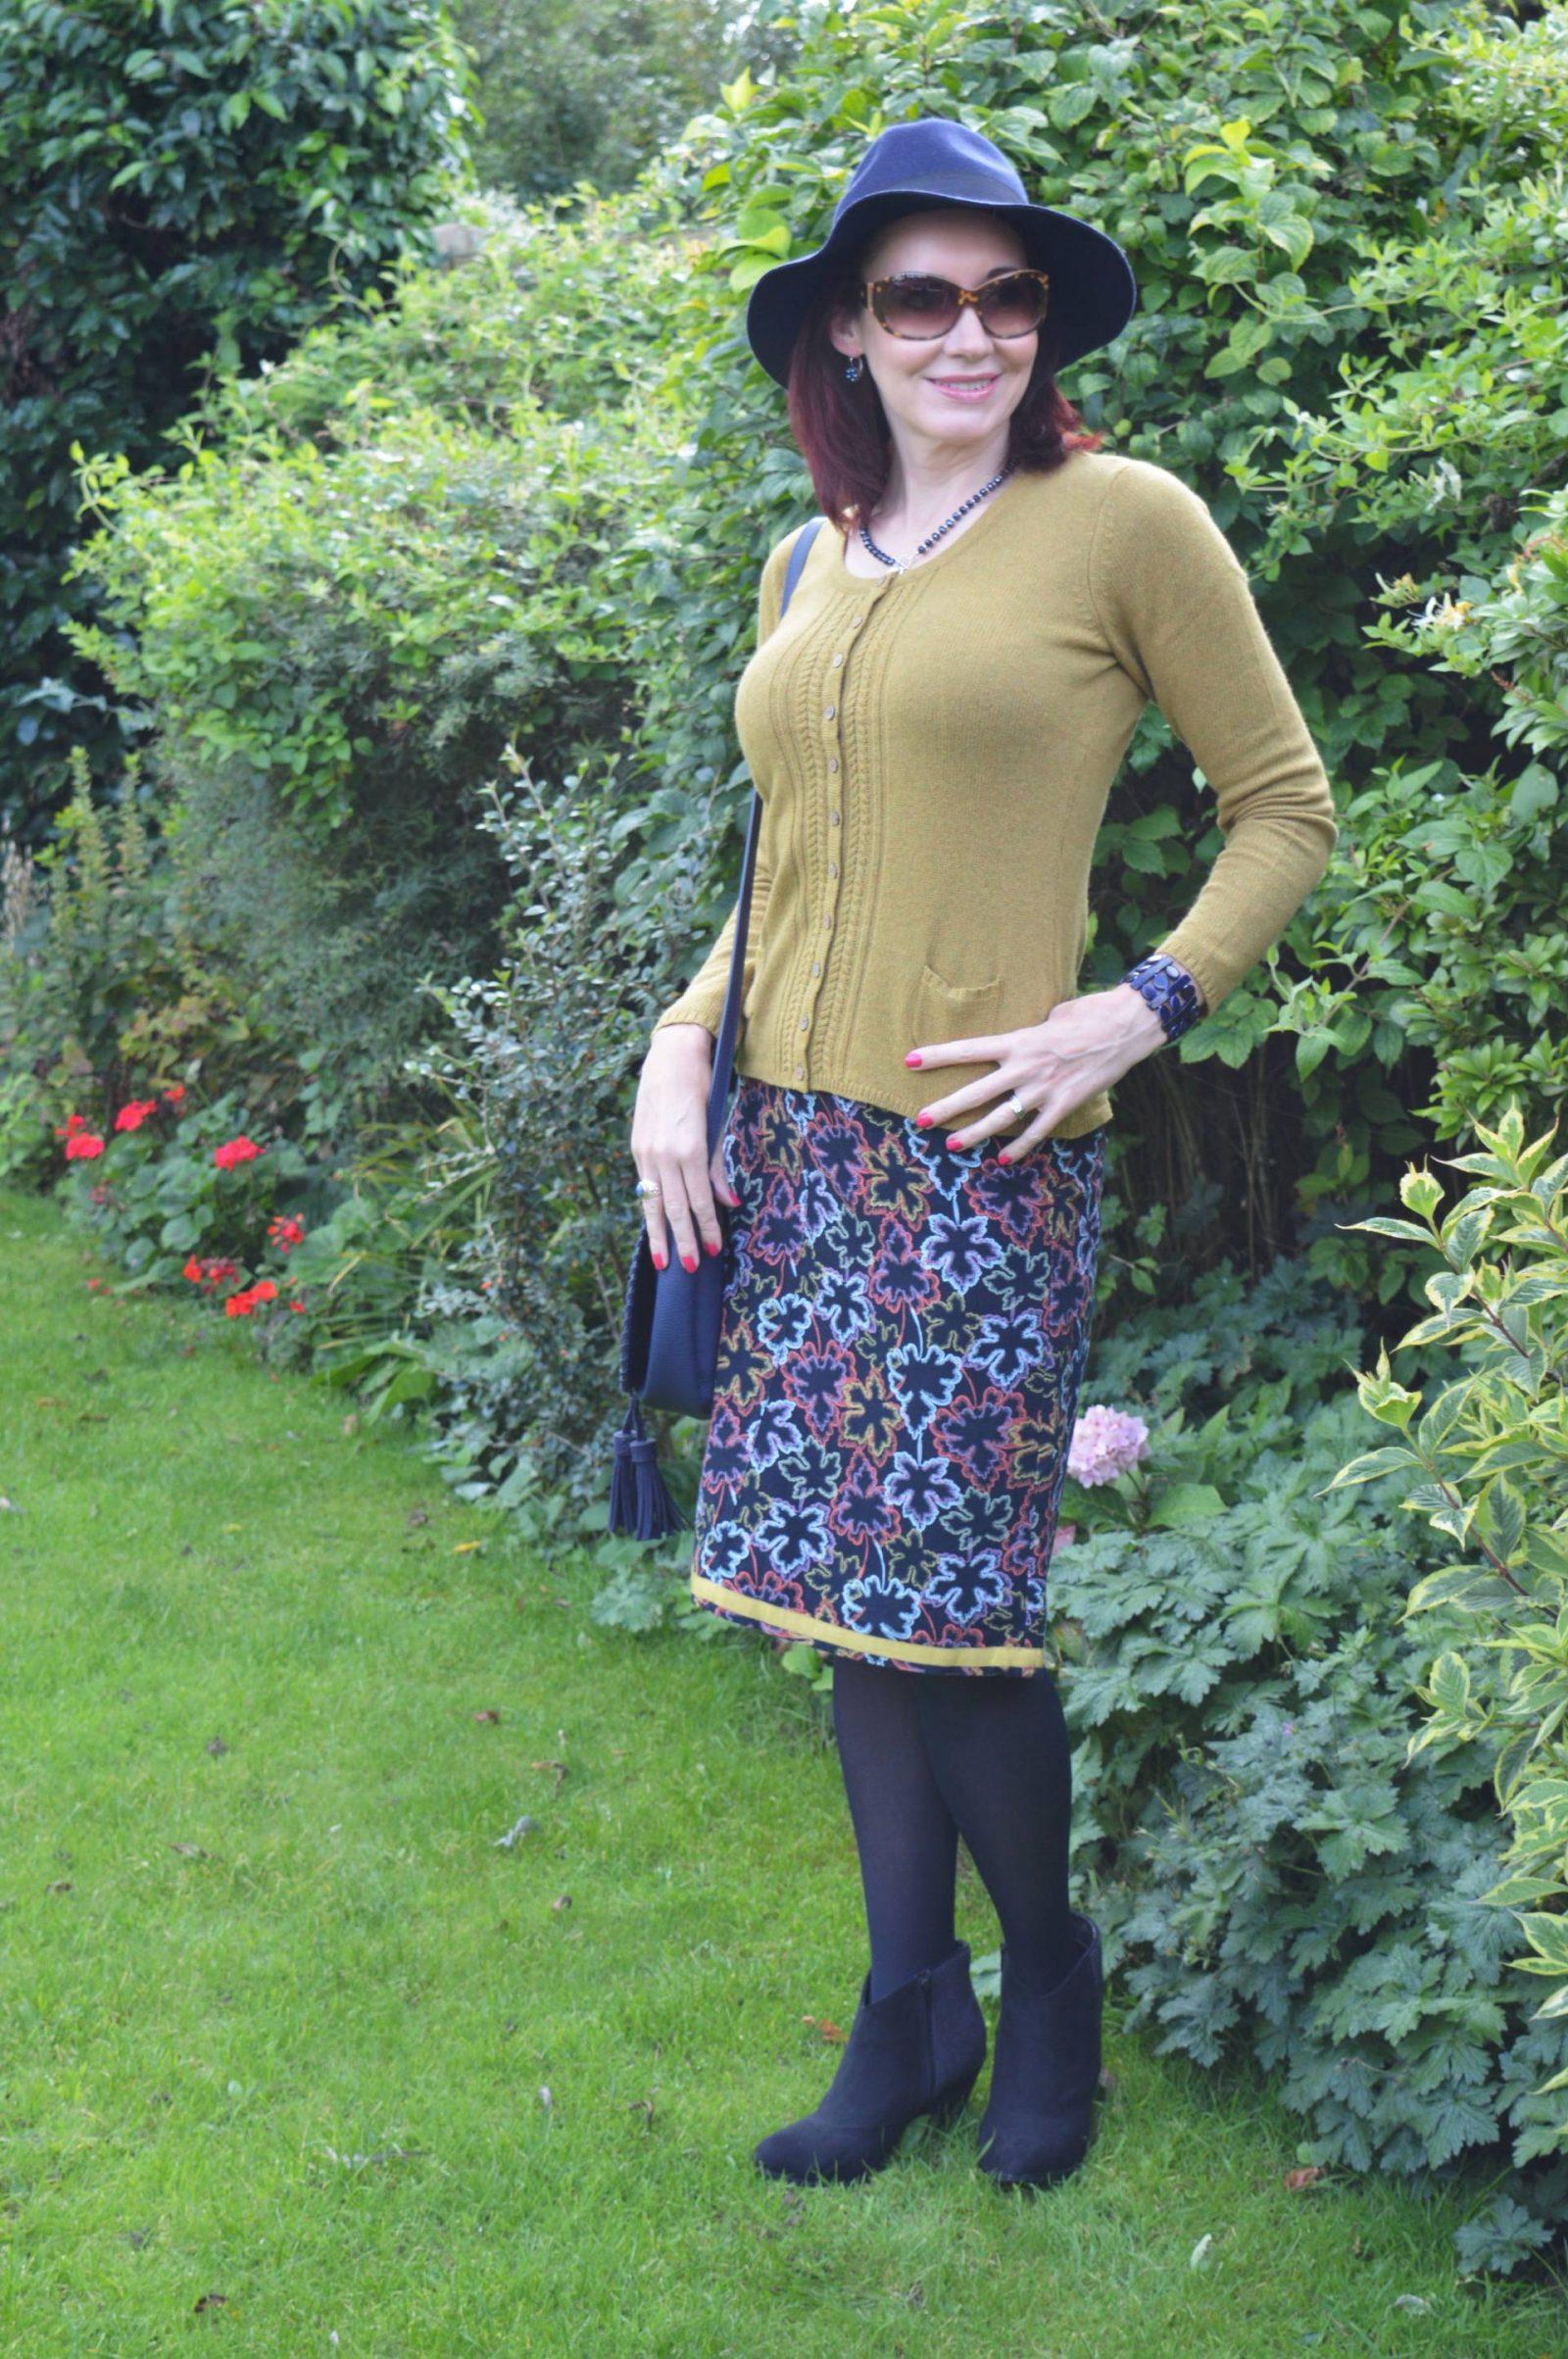 Mistral Cardigan and Leaf Print Skirt